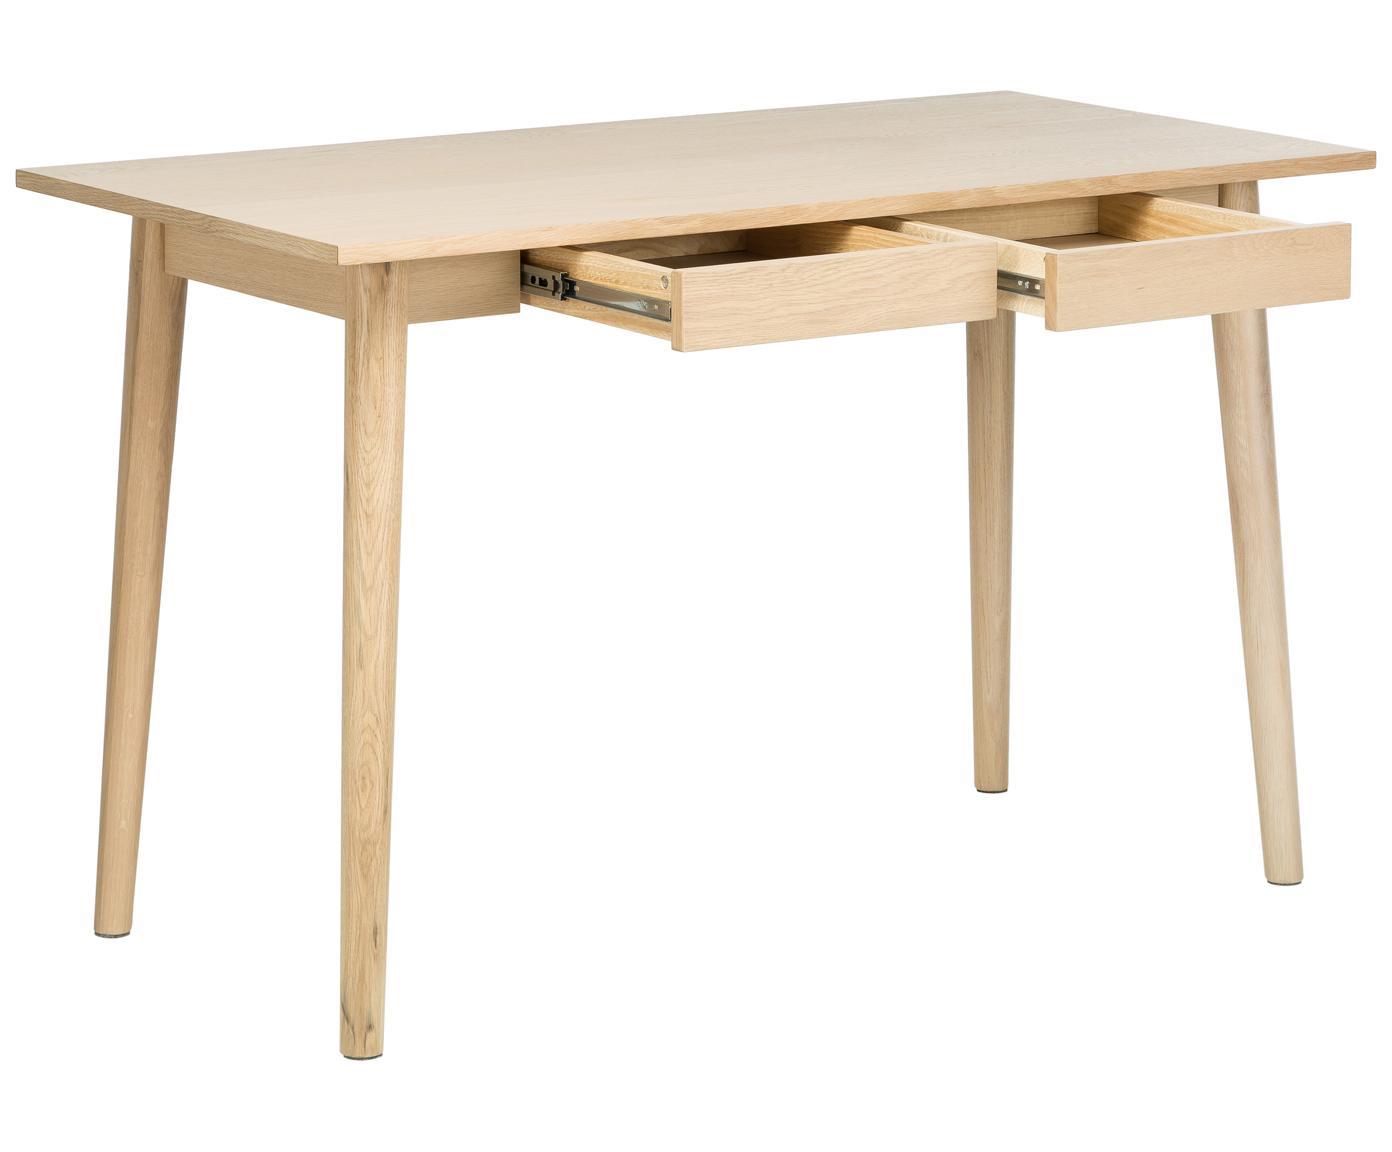 Bureau Marte, Tafelblad: medium-density fibreboard, Wit gepigmenteerd eikenhoutkleurig, B 120 x D 60 cm